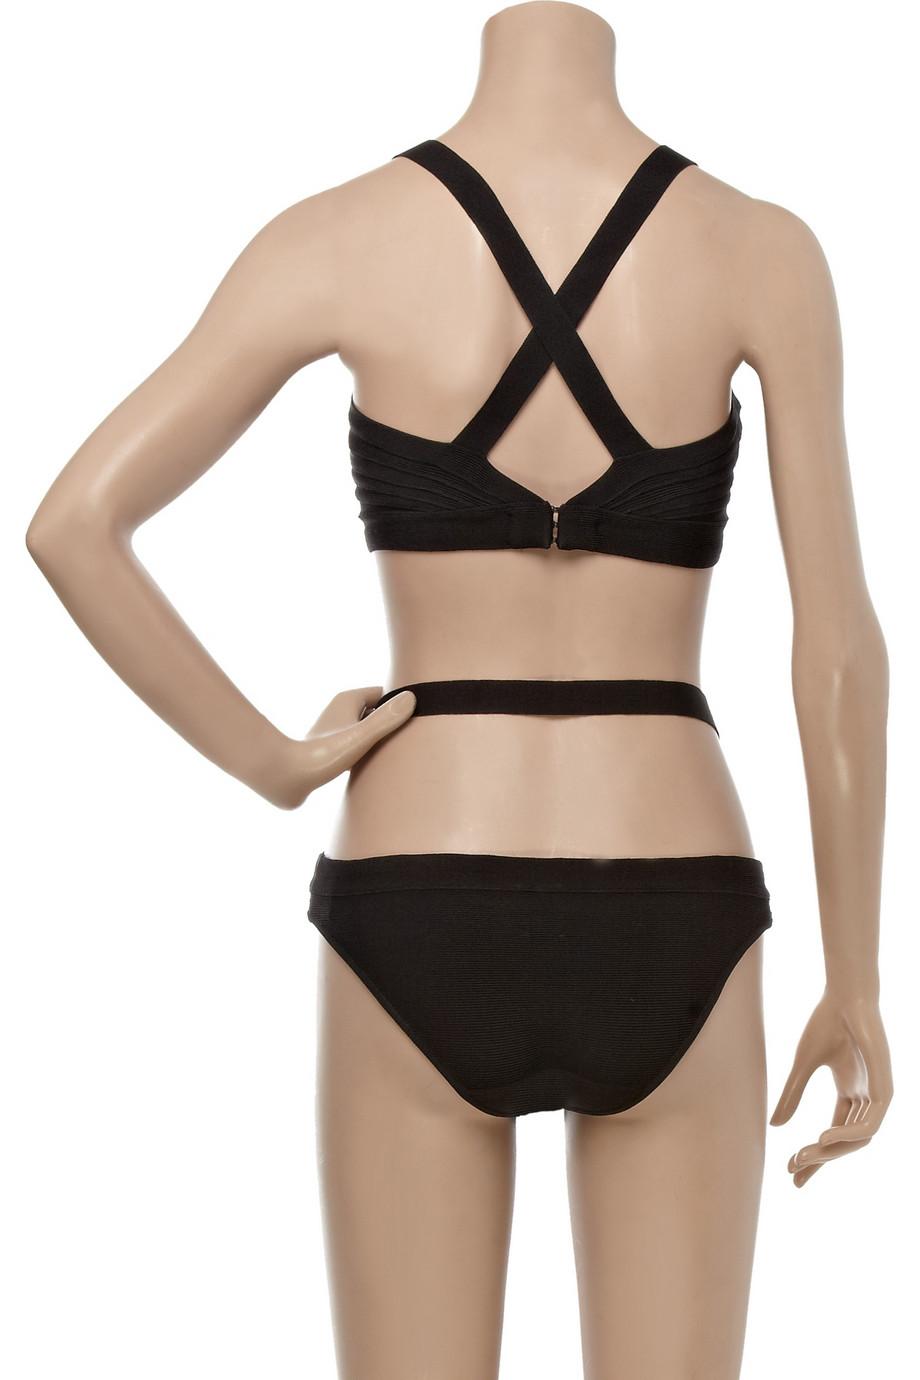 Lyst Herv 233 L 233 Ger Martine Cutout Bandage Sunsuit In Black